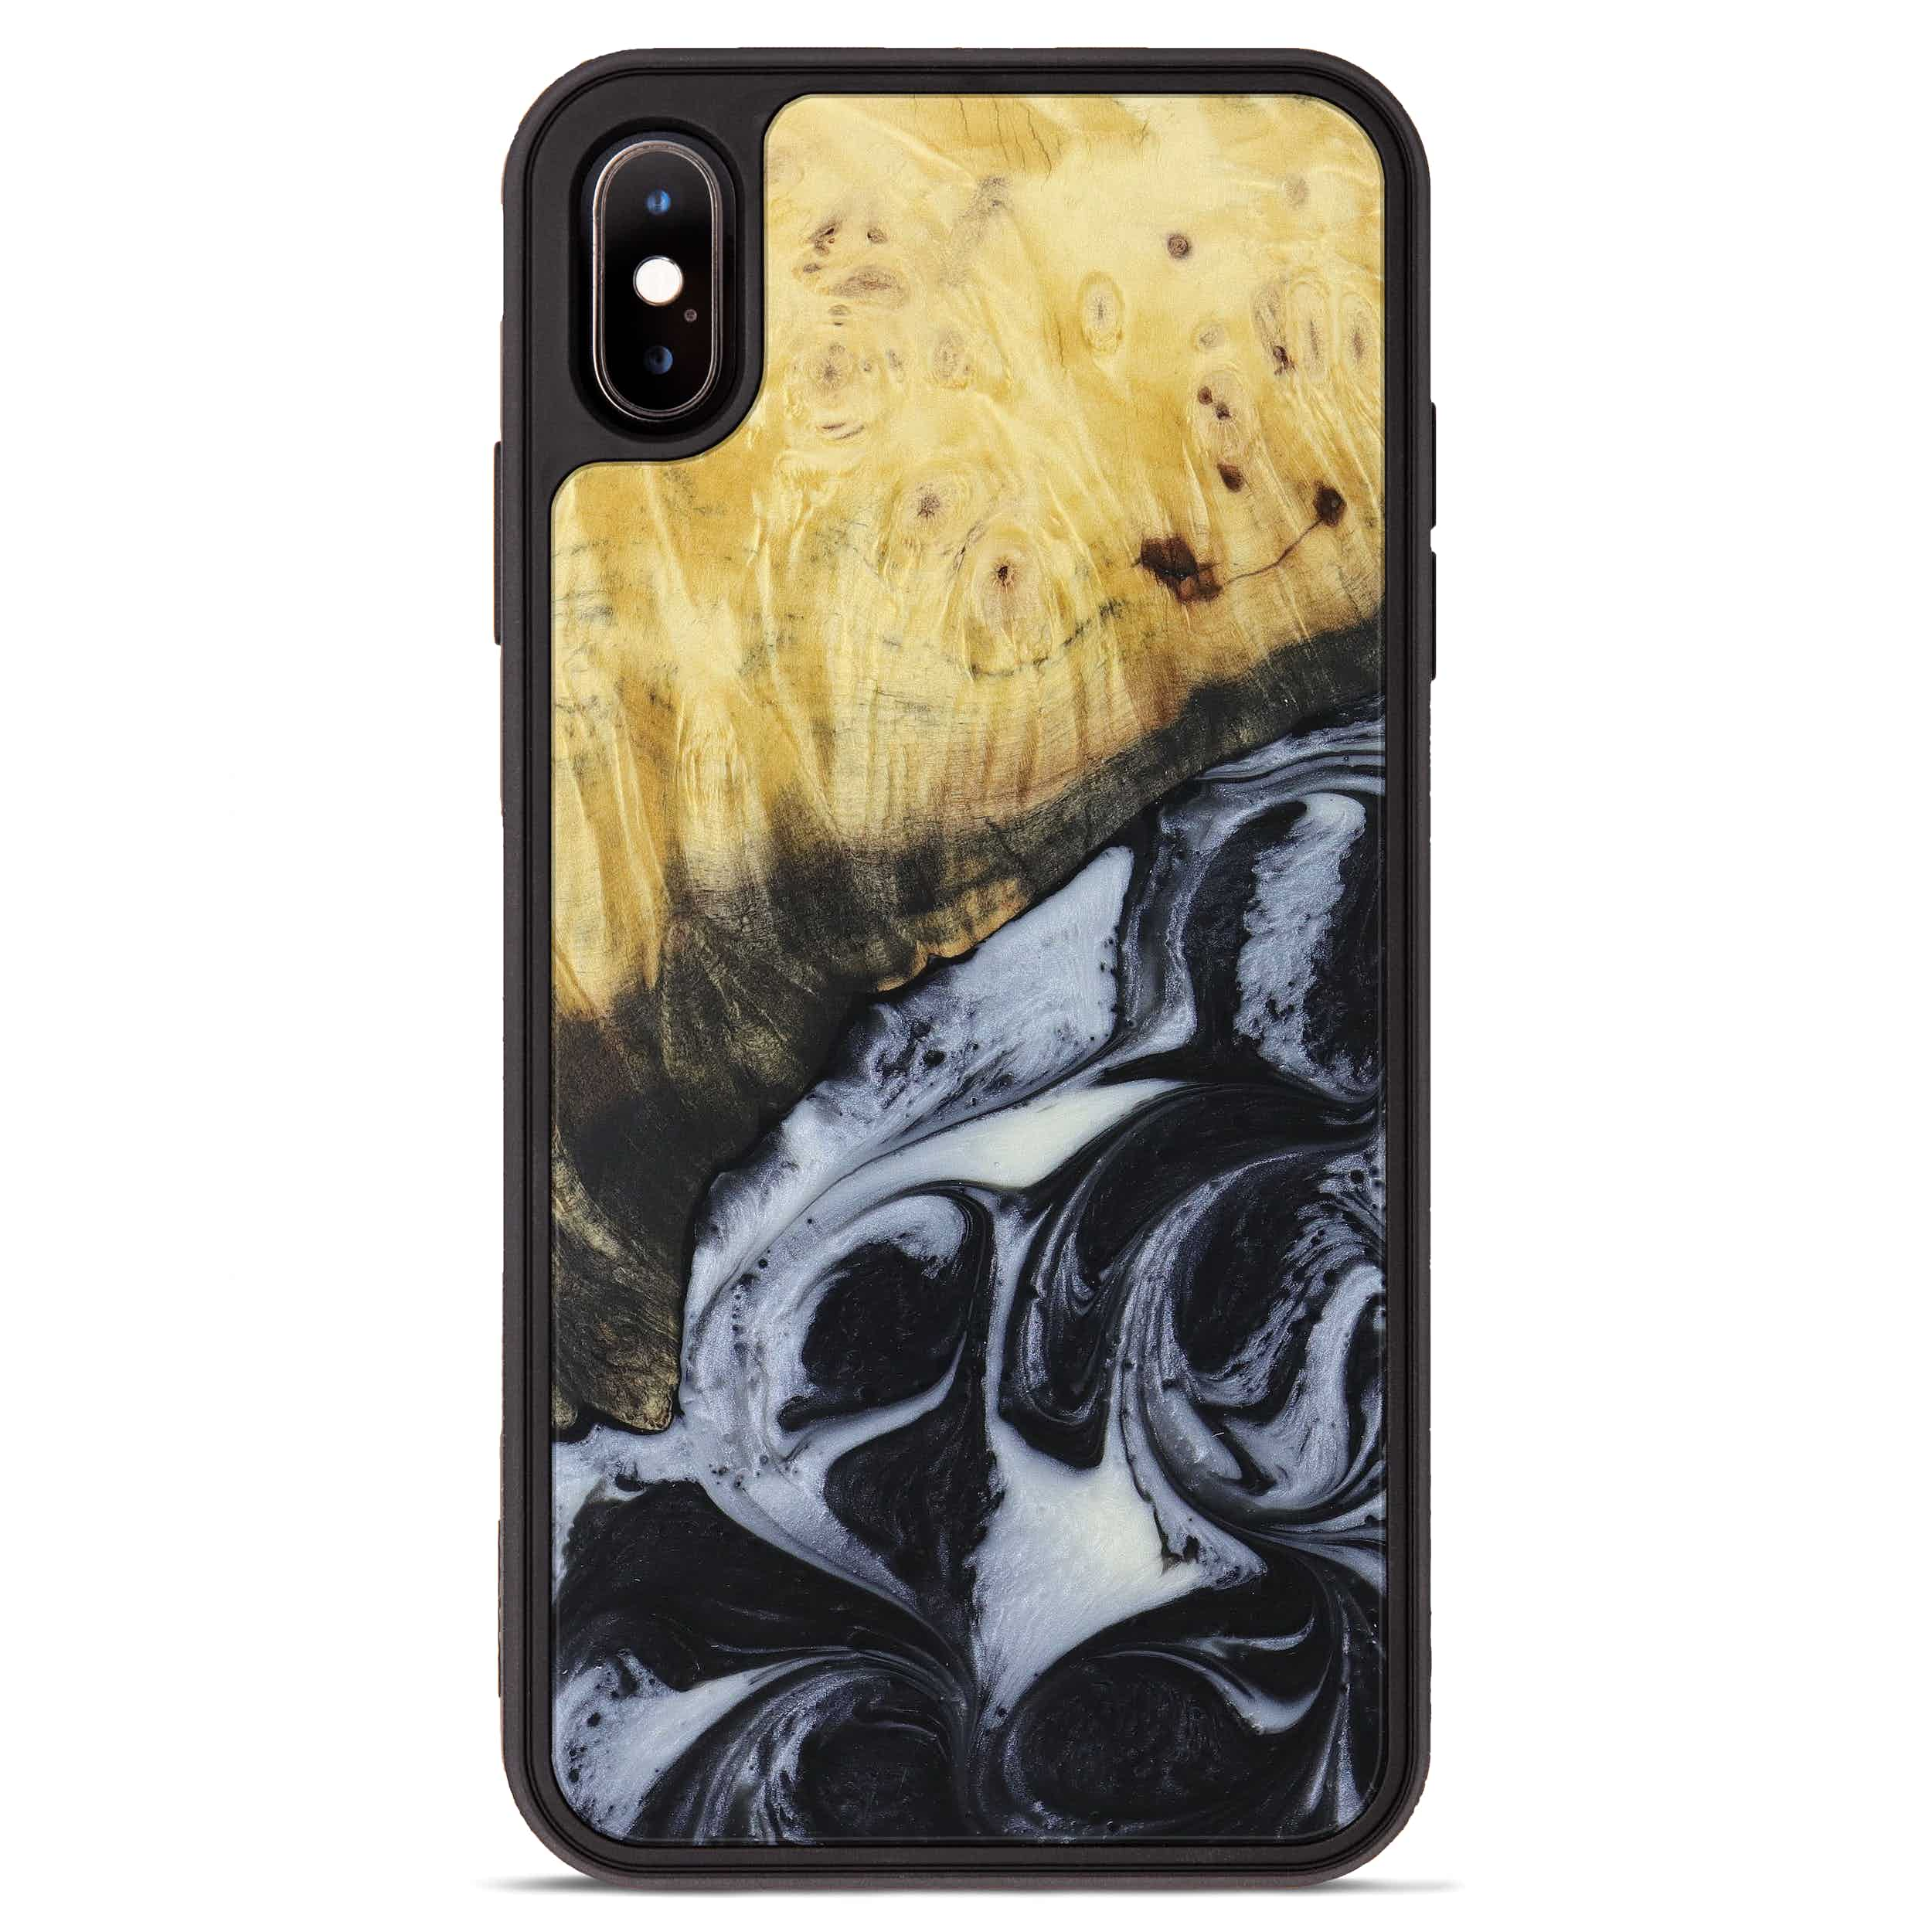 iPhone Xs Max Wood+Resin Phone Case - Jason (Black & White, 397902)